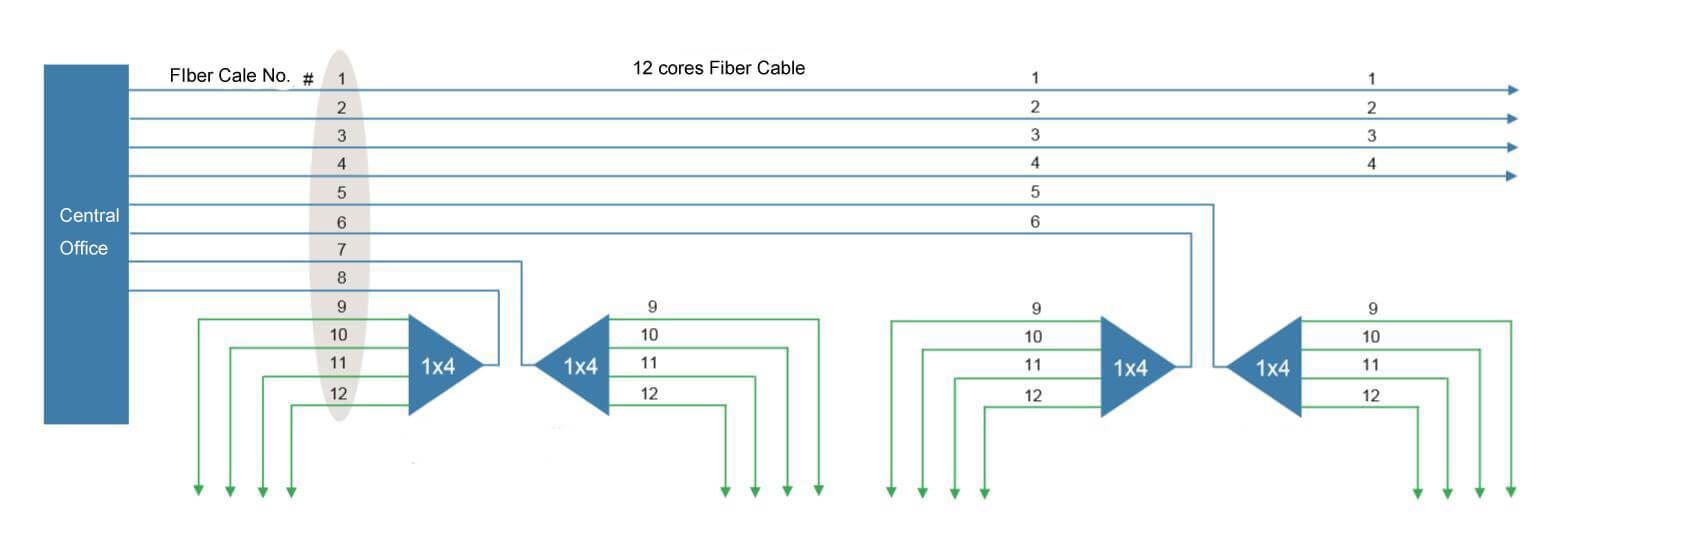 cascaded multiplexing - FTTH Architecture Contruction Methods